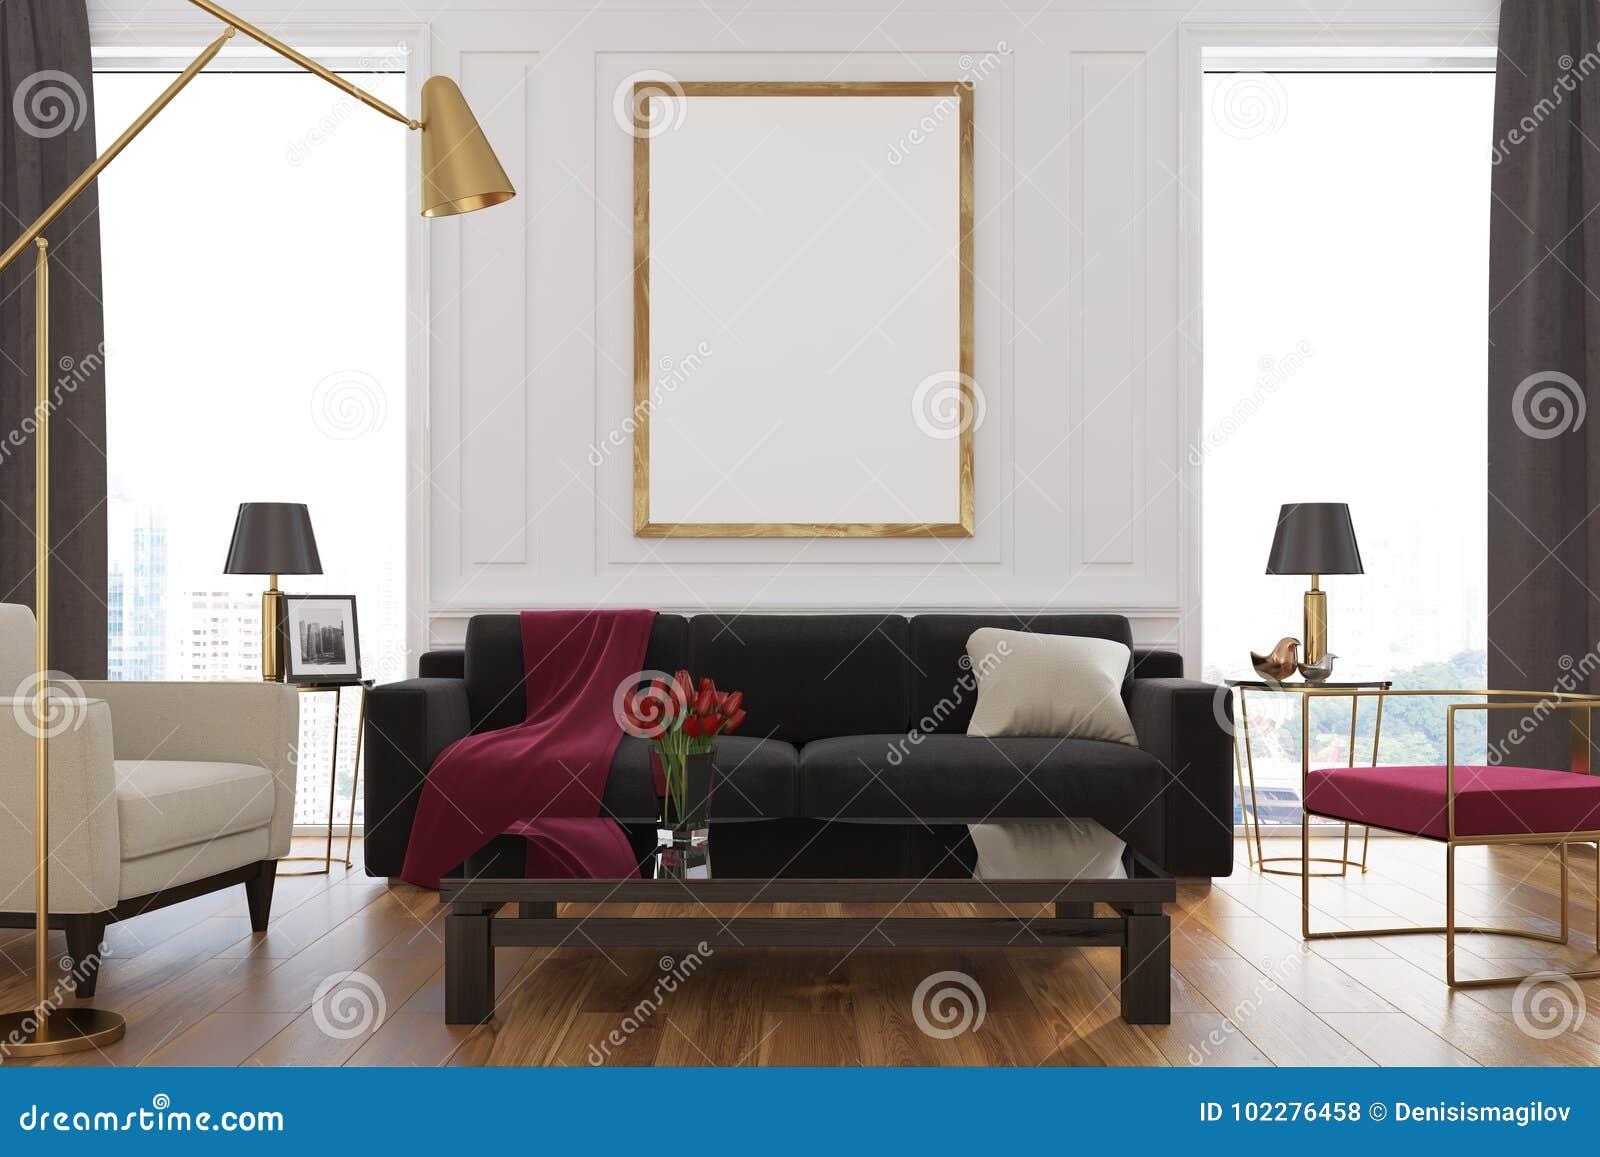 Picture of: White Living Room Sofa Poster Stock Illustration Illustration Of House Minimal 102276458